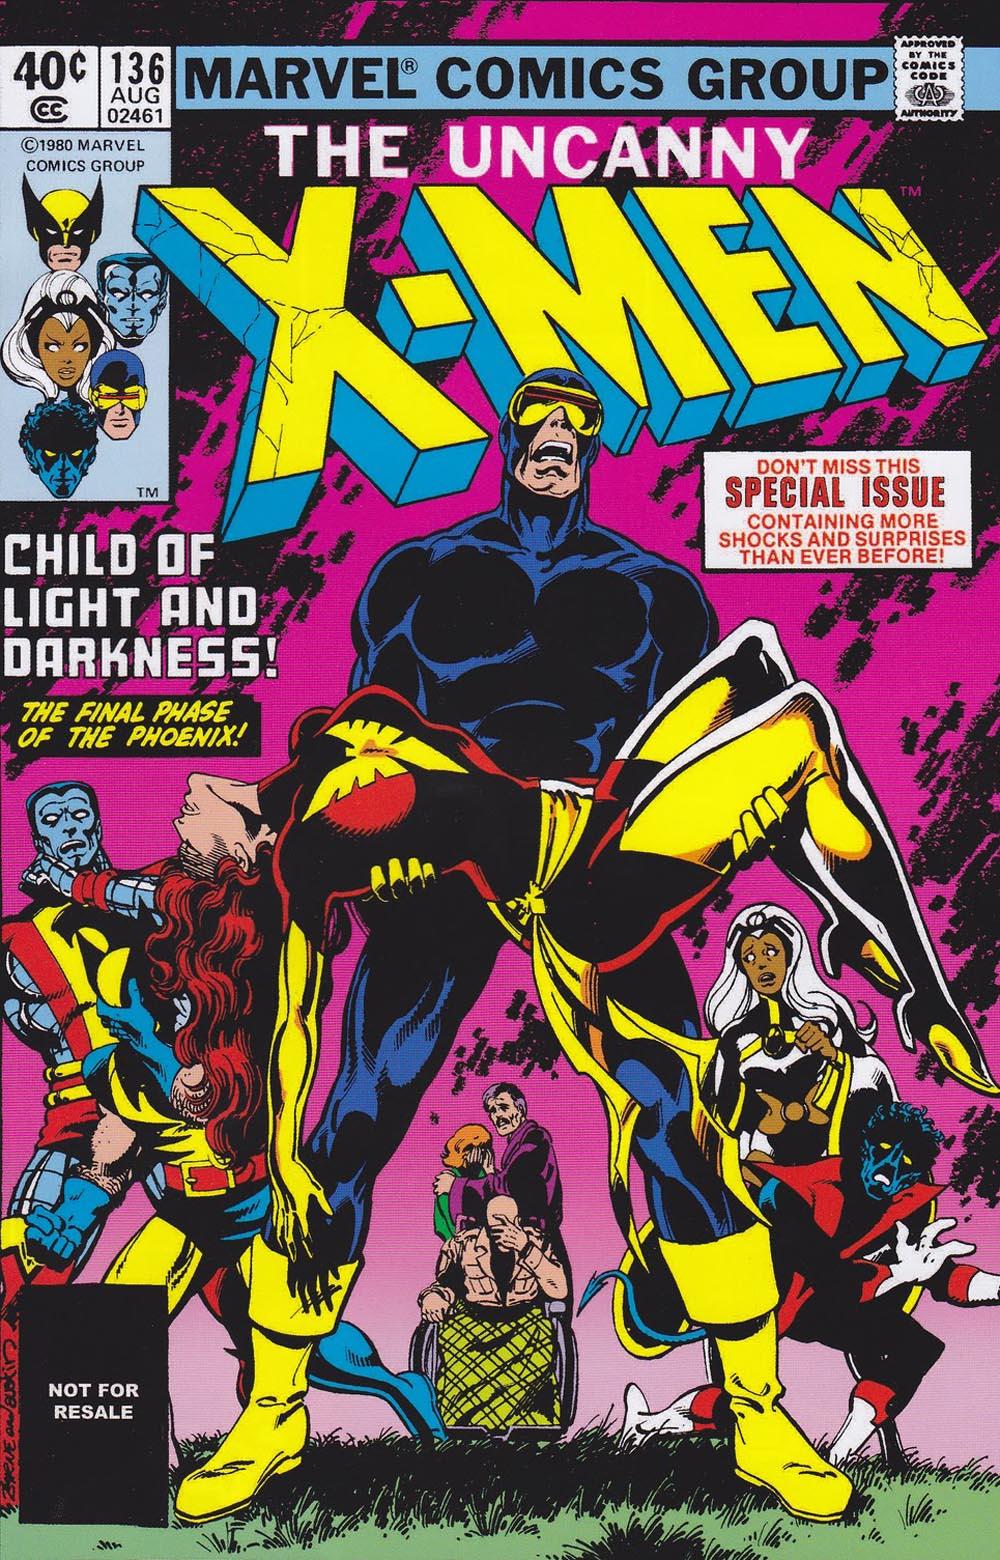 uncanny-x-men-cover-136.jpg